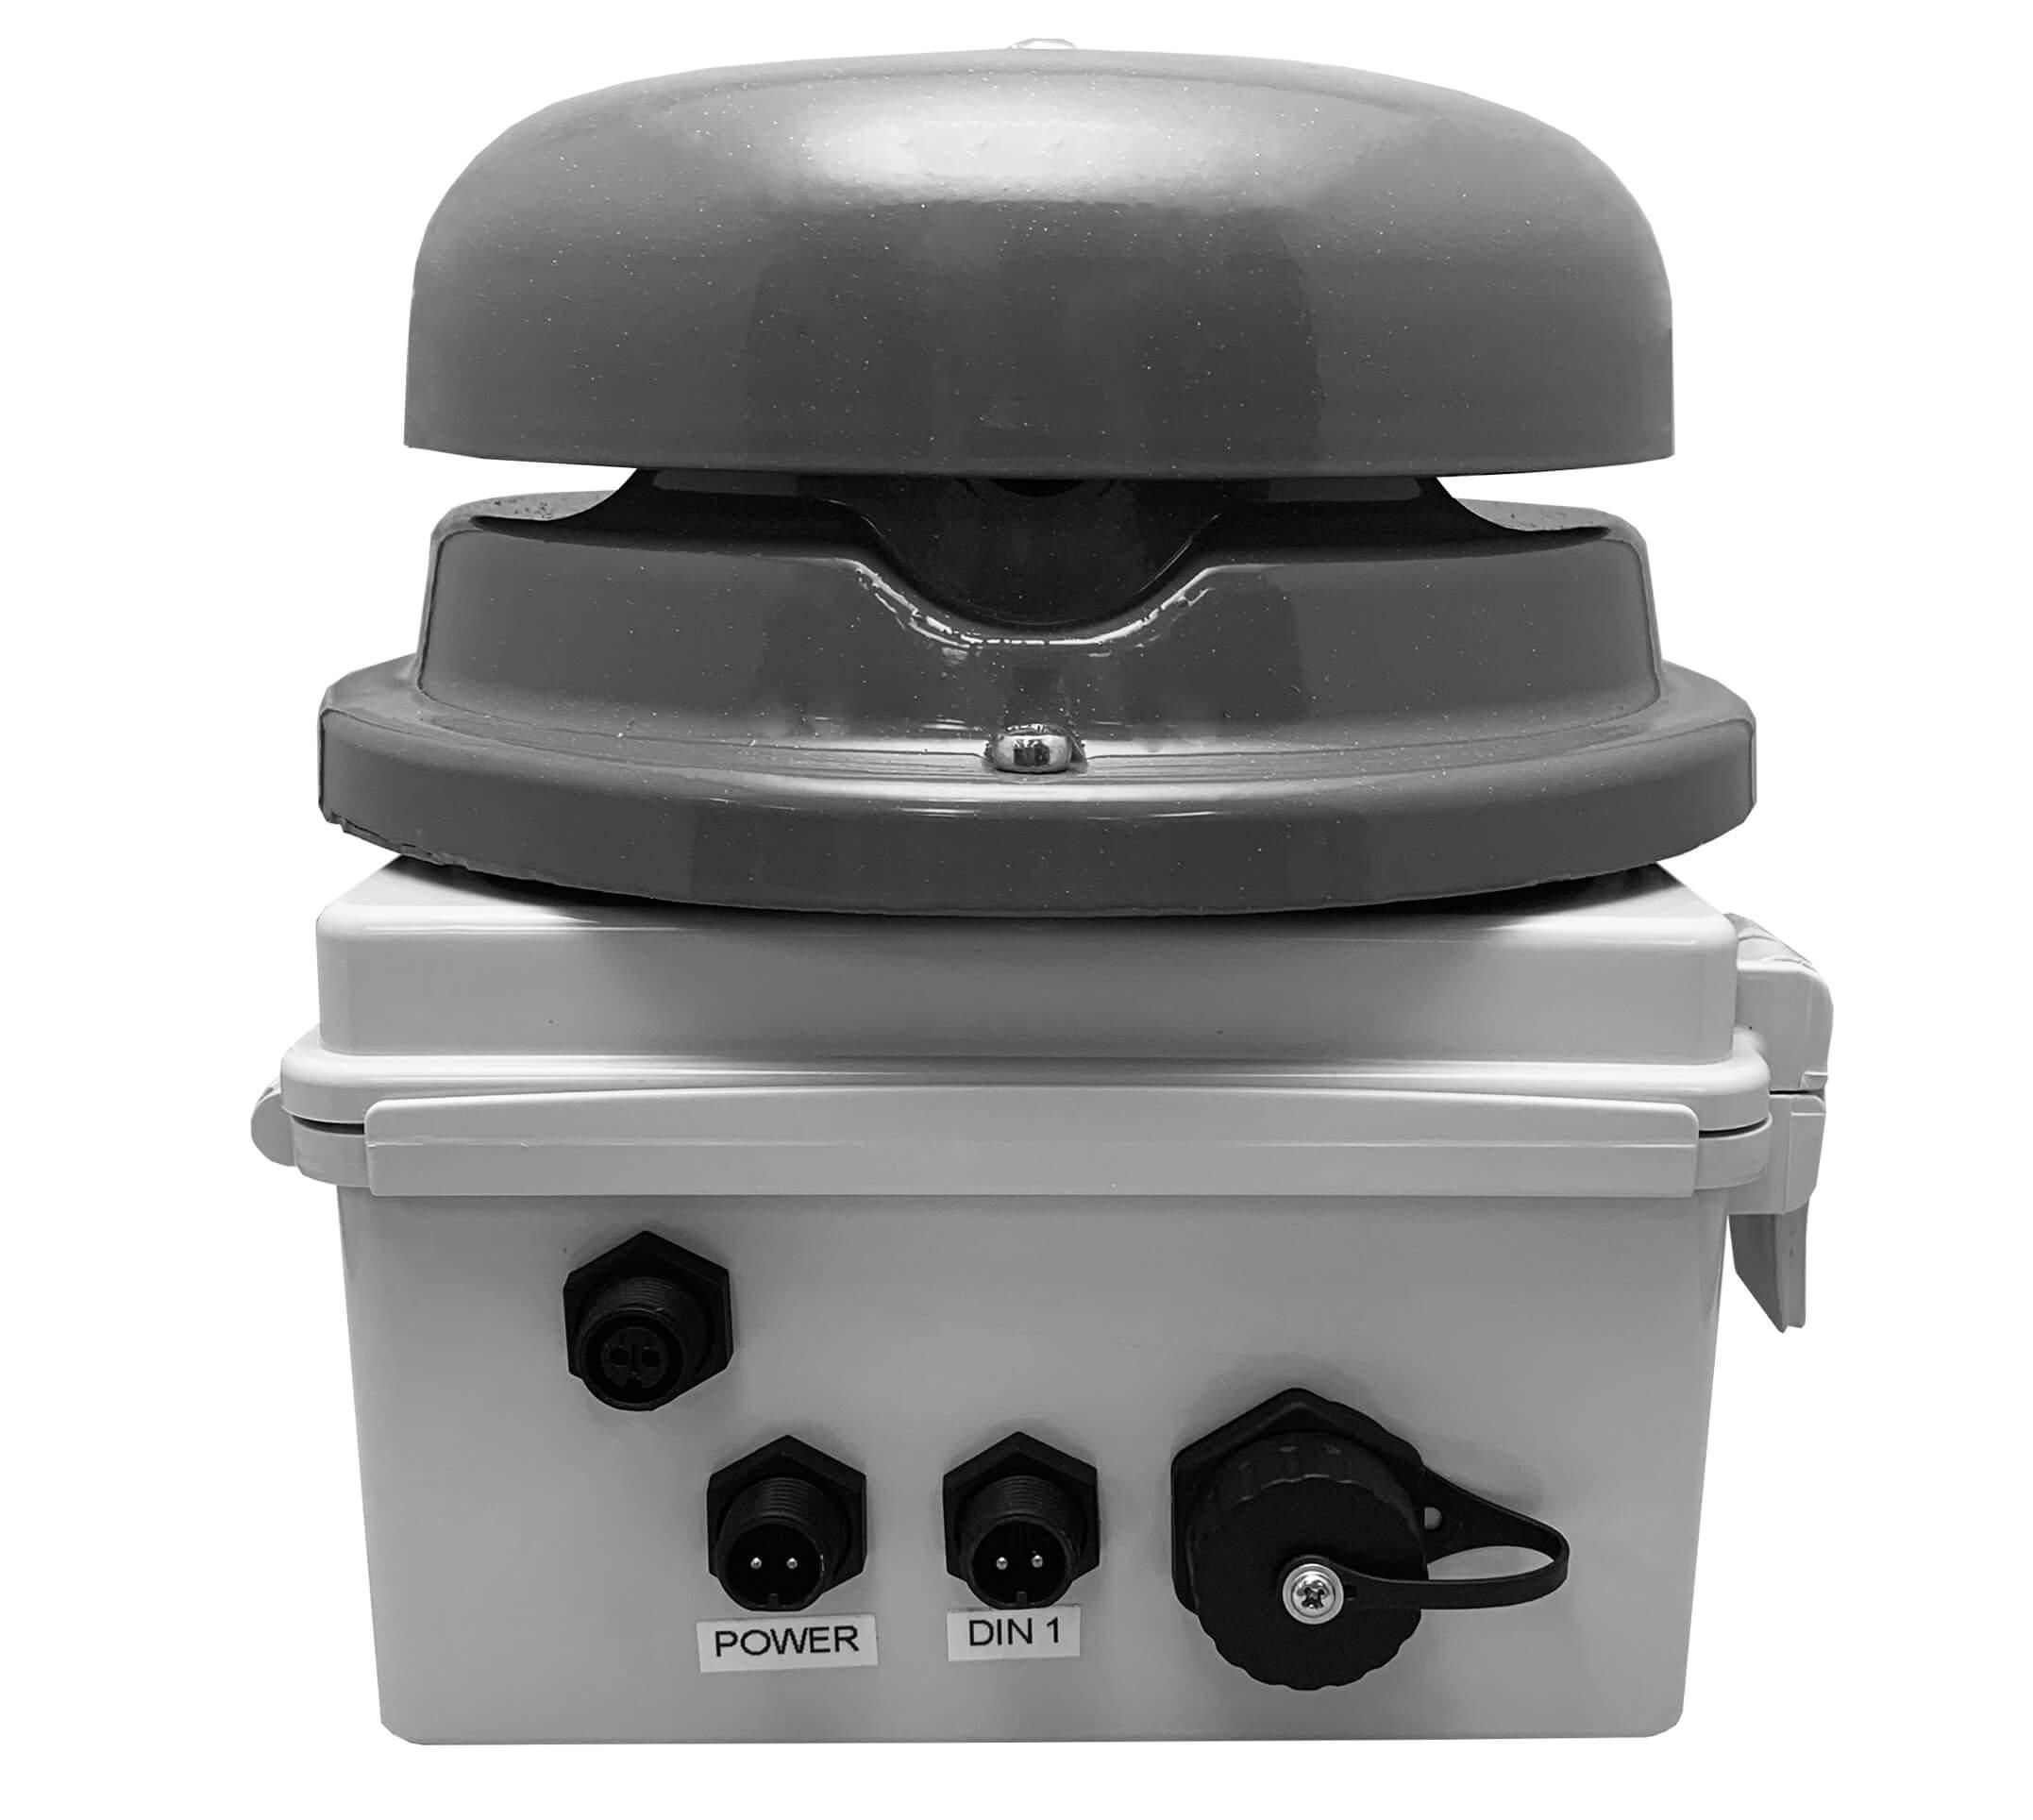 Netbell-KL Network All-in-One Extra Loud Break Bell System